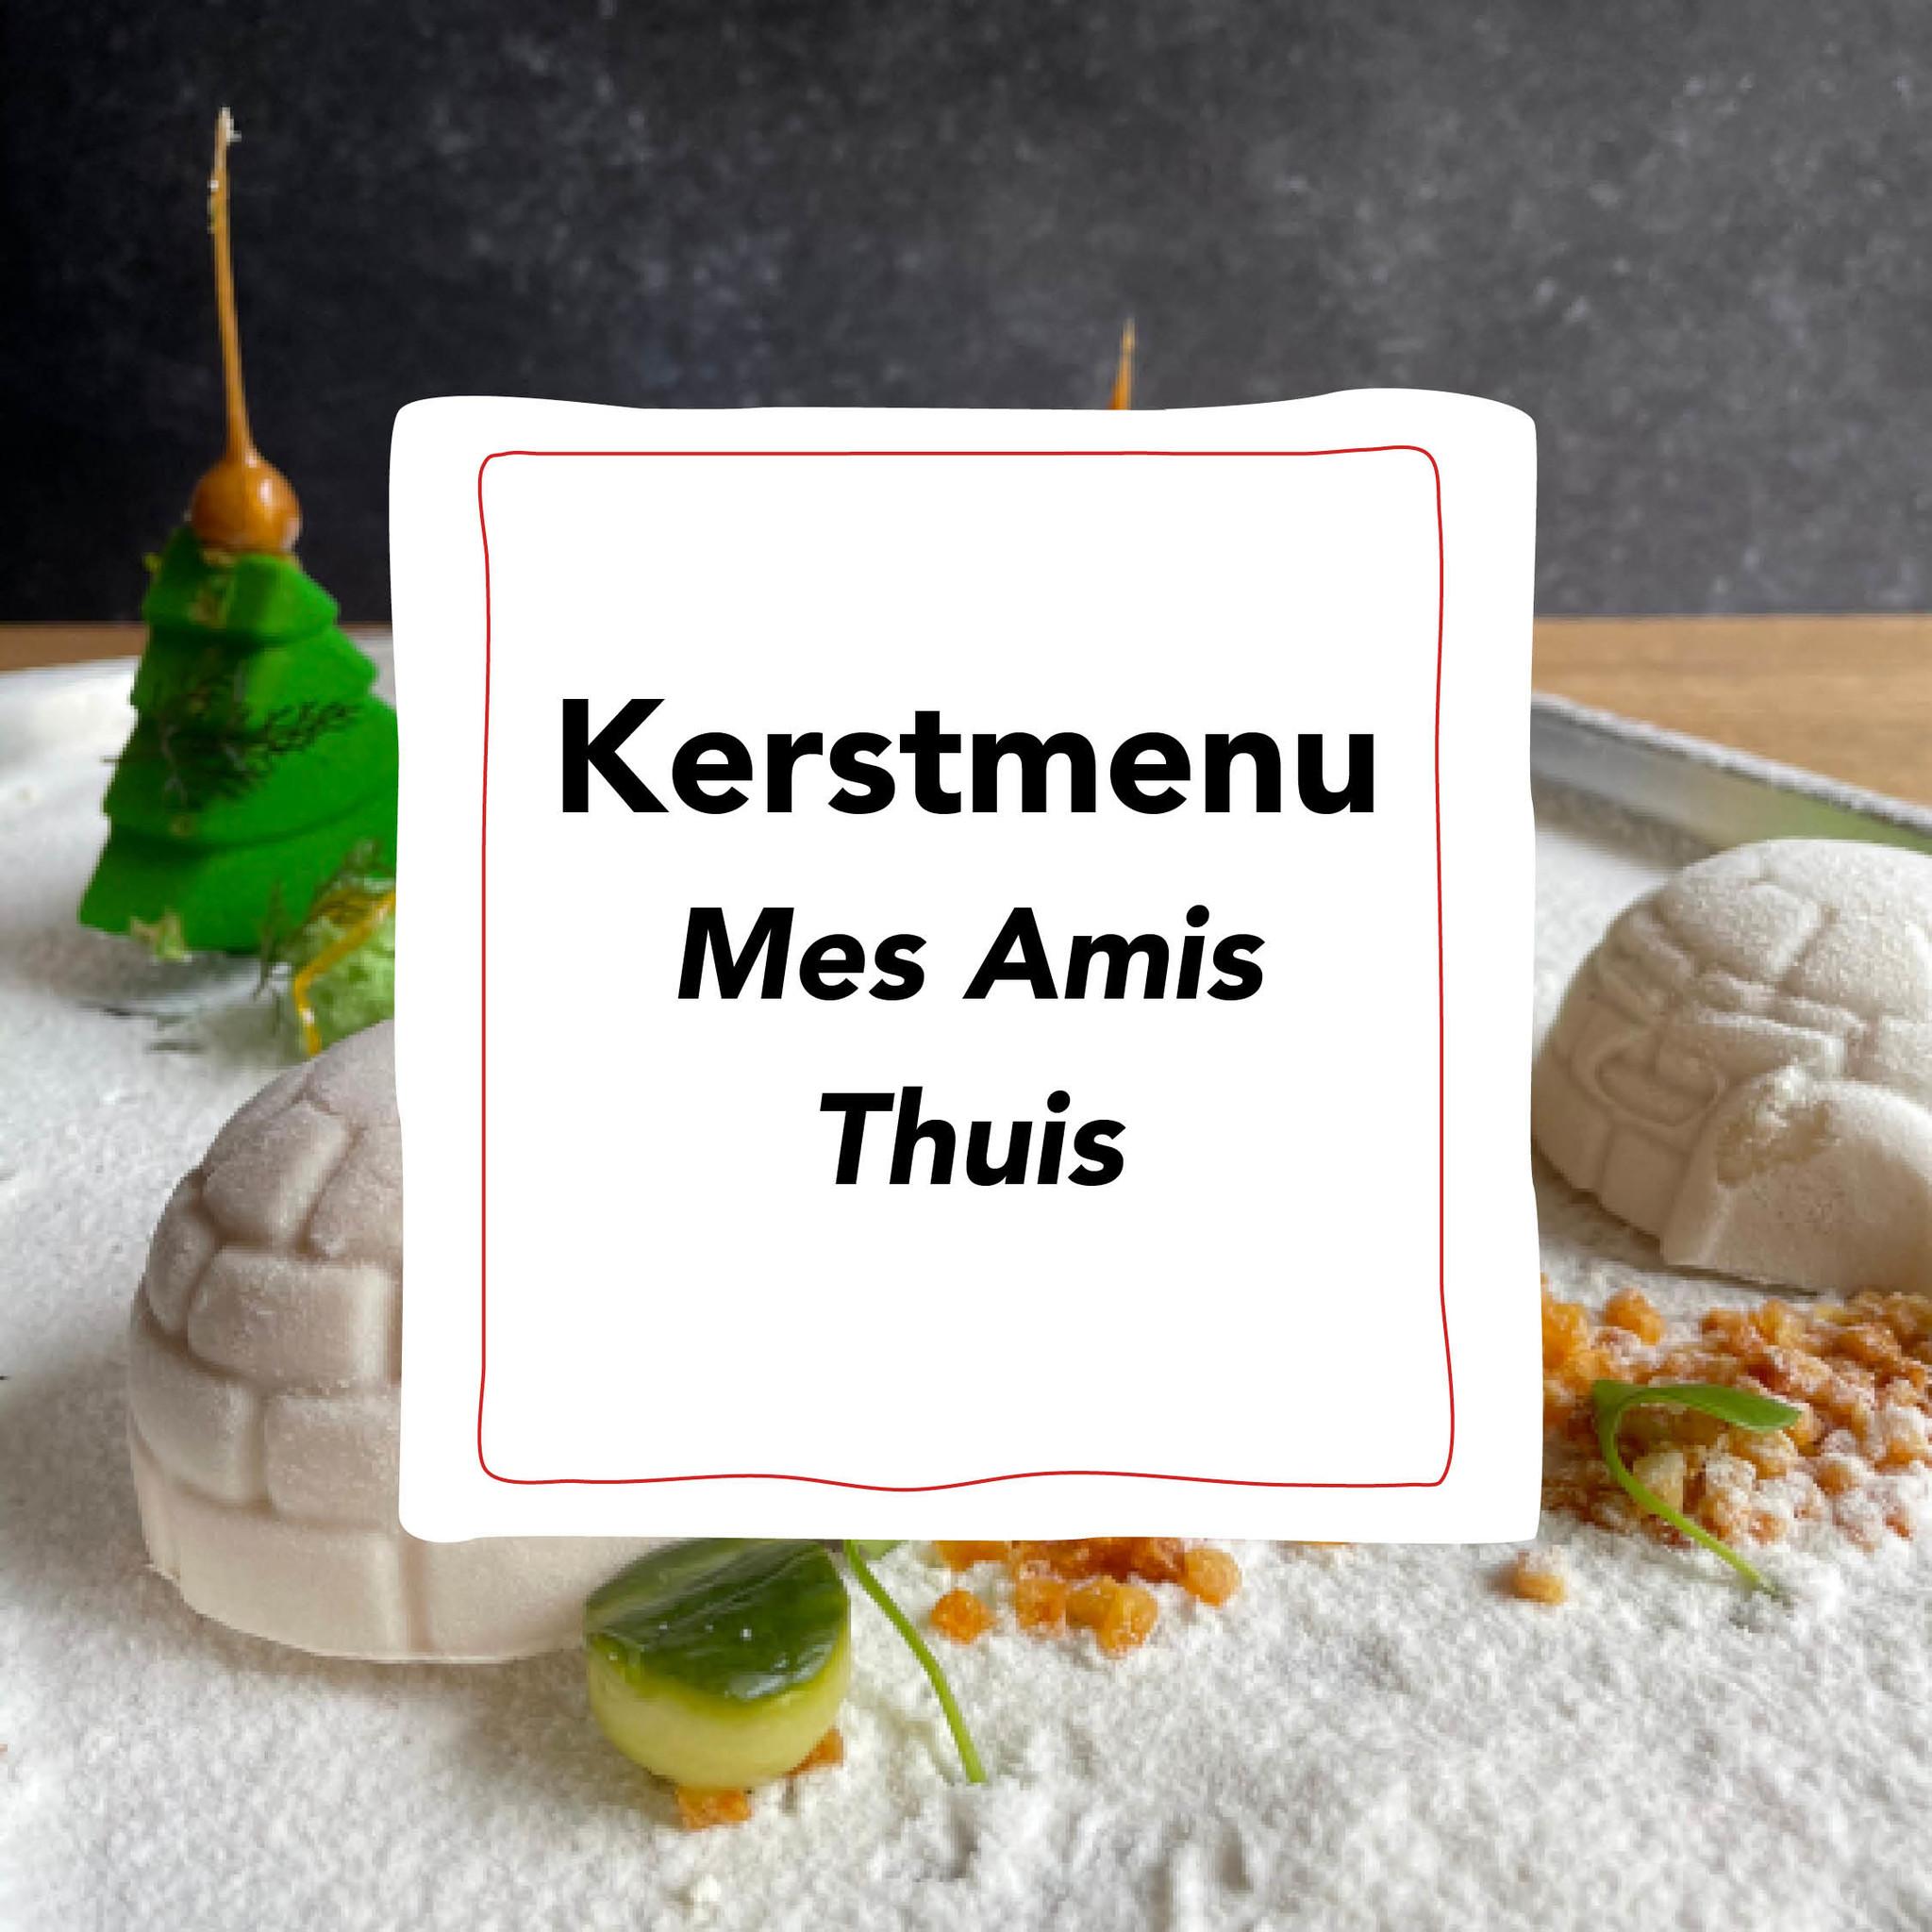 Kerstmenu vegetarisch 5 gangen-1